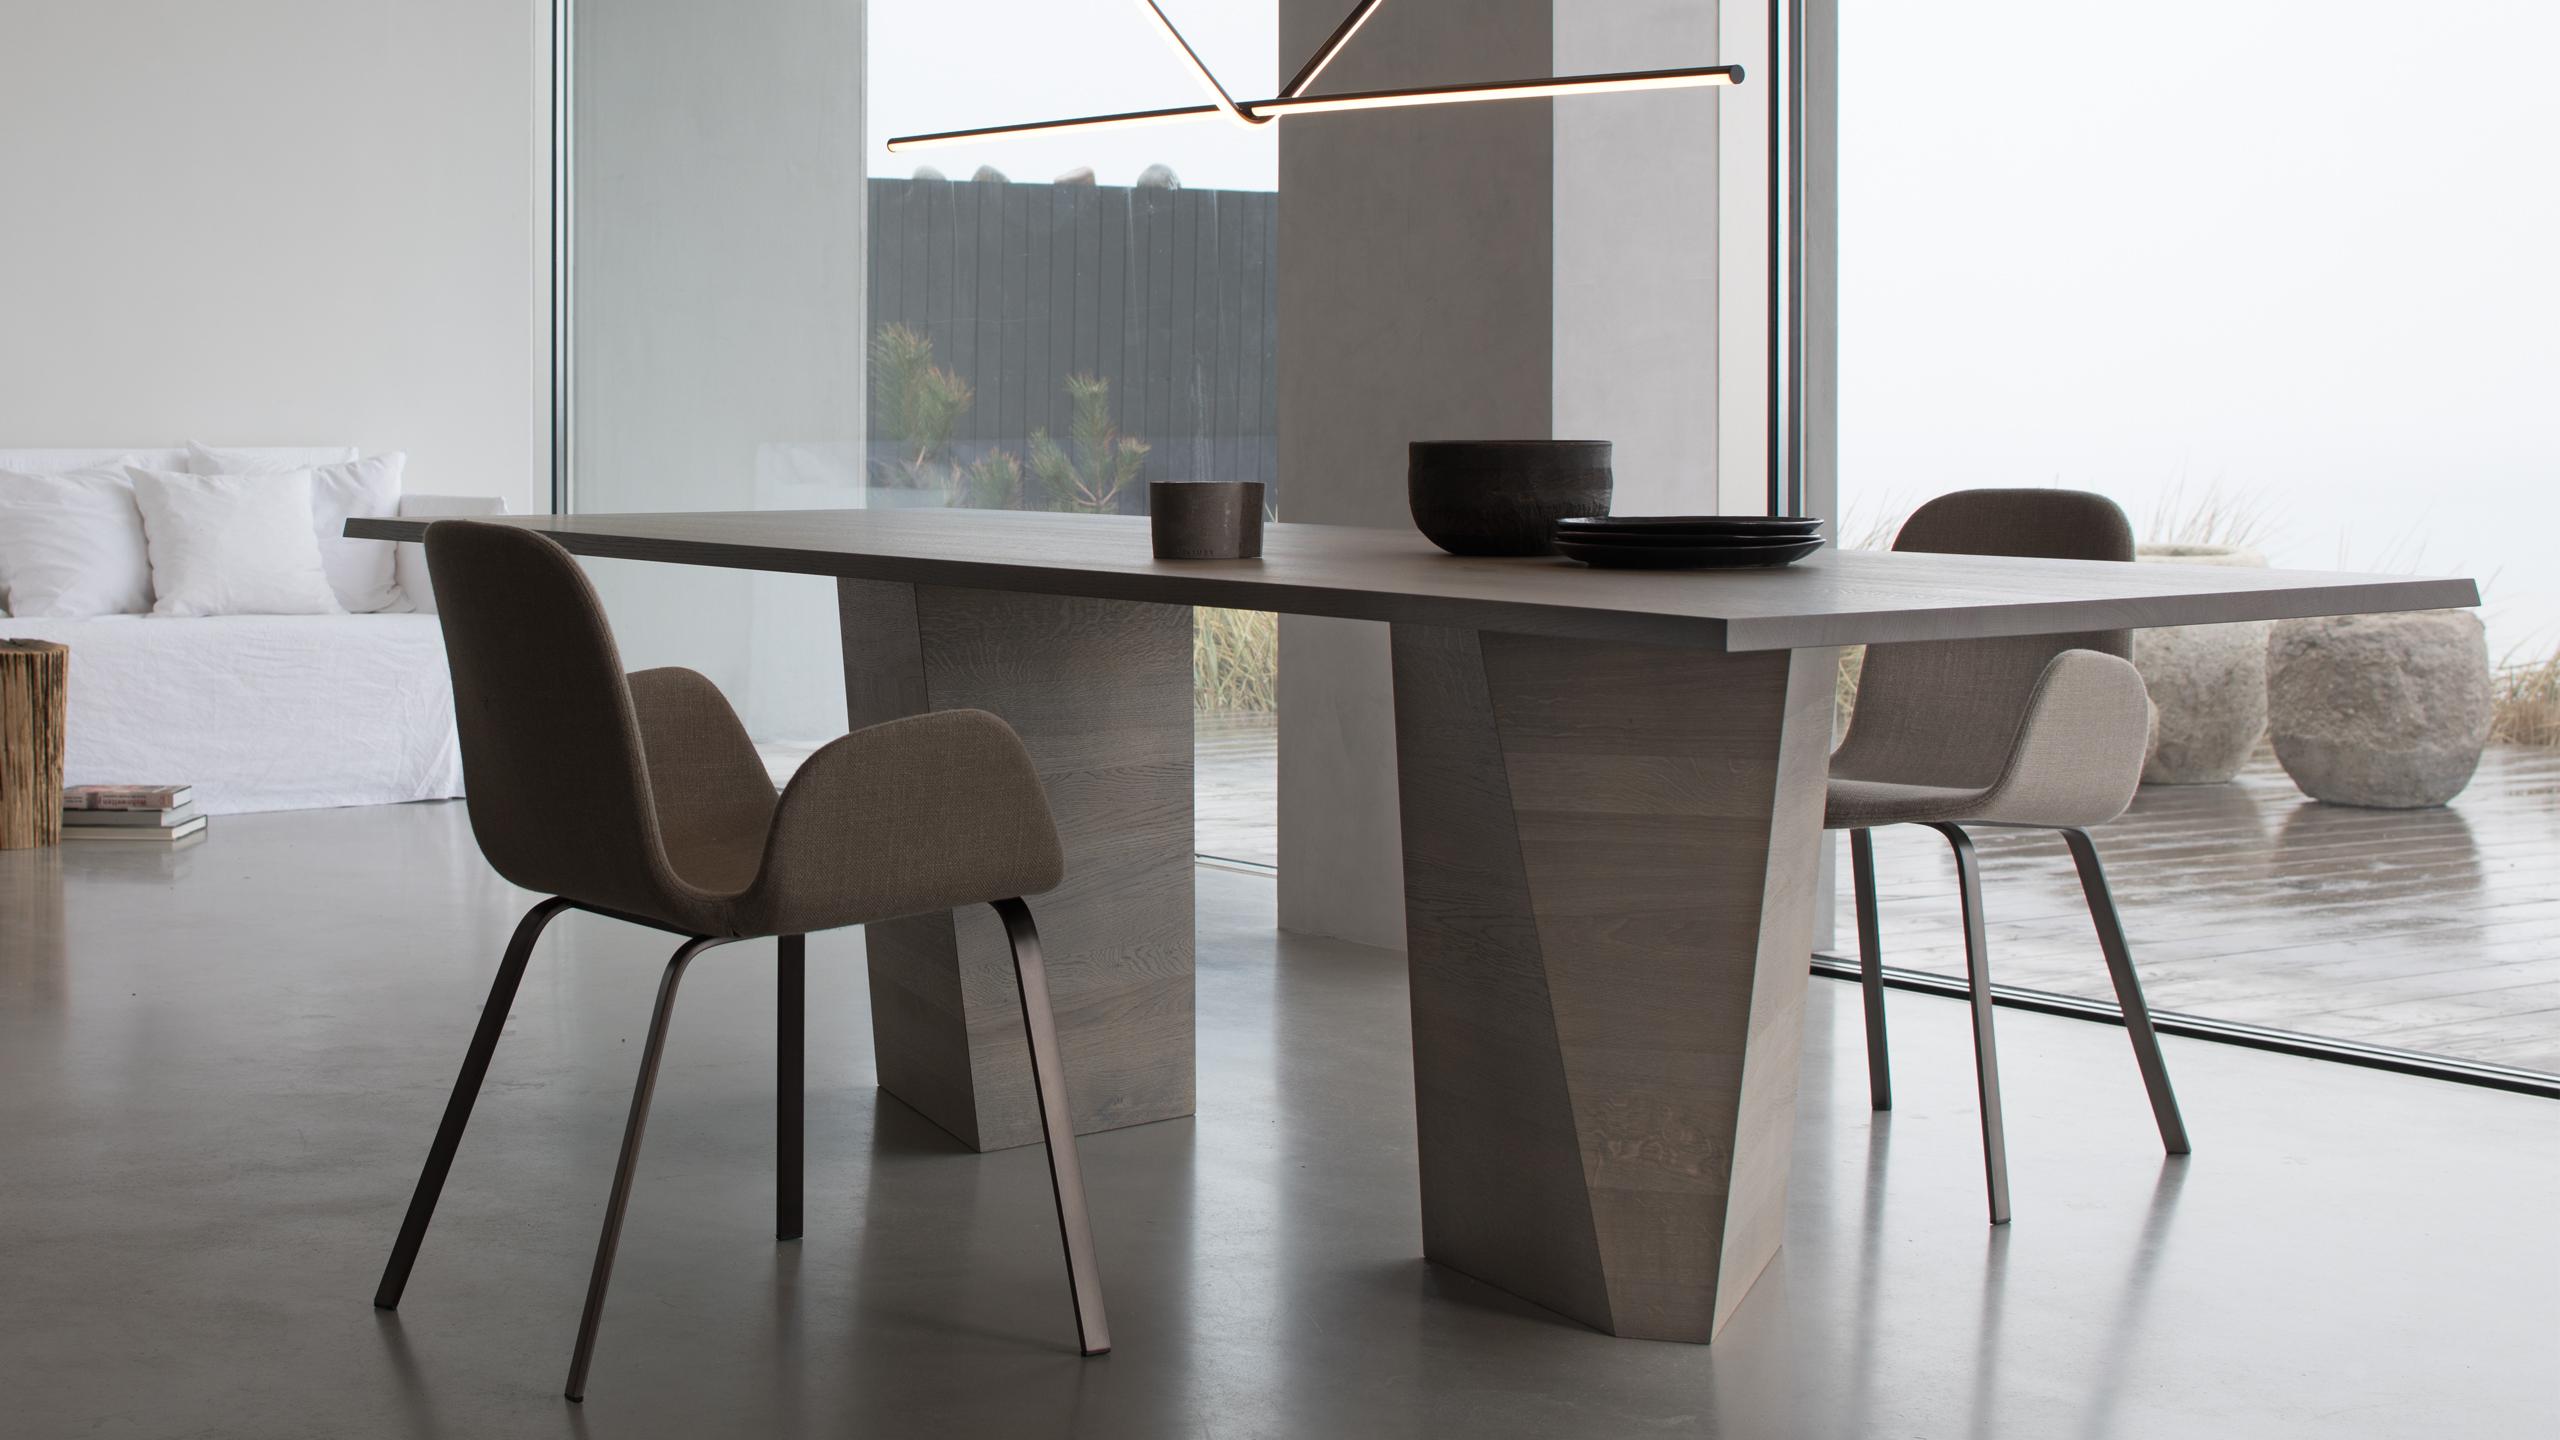 frankfurt mbelhaus with frankfurt mbelhaus stunning. Black Bedroom Furniture Sets. Home Design Ideas